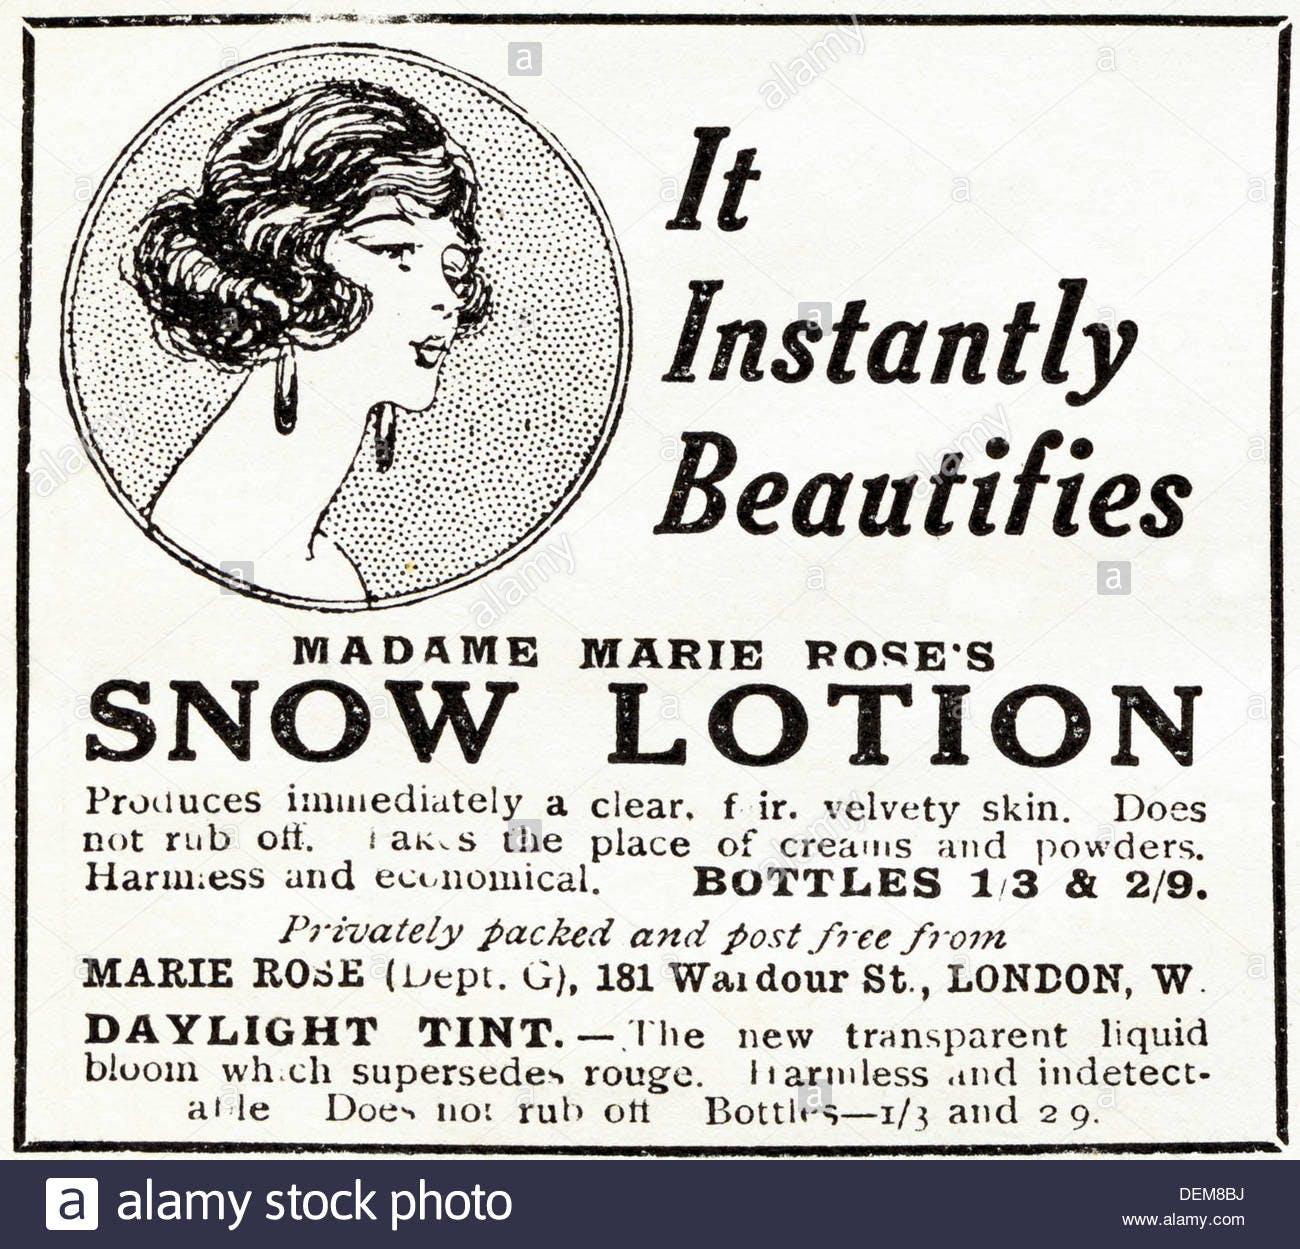 Original 1920s Advertisement Advertising Madame Marie Roses Snow Lotion Dem8bj